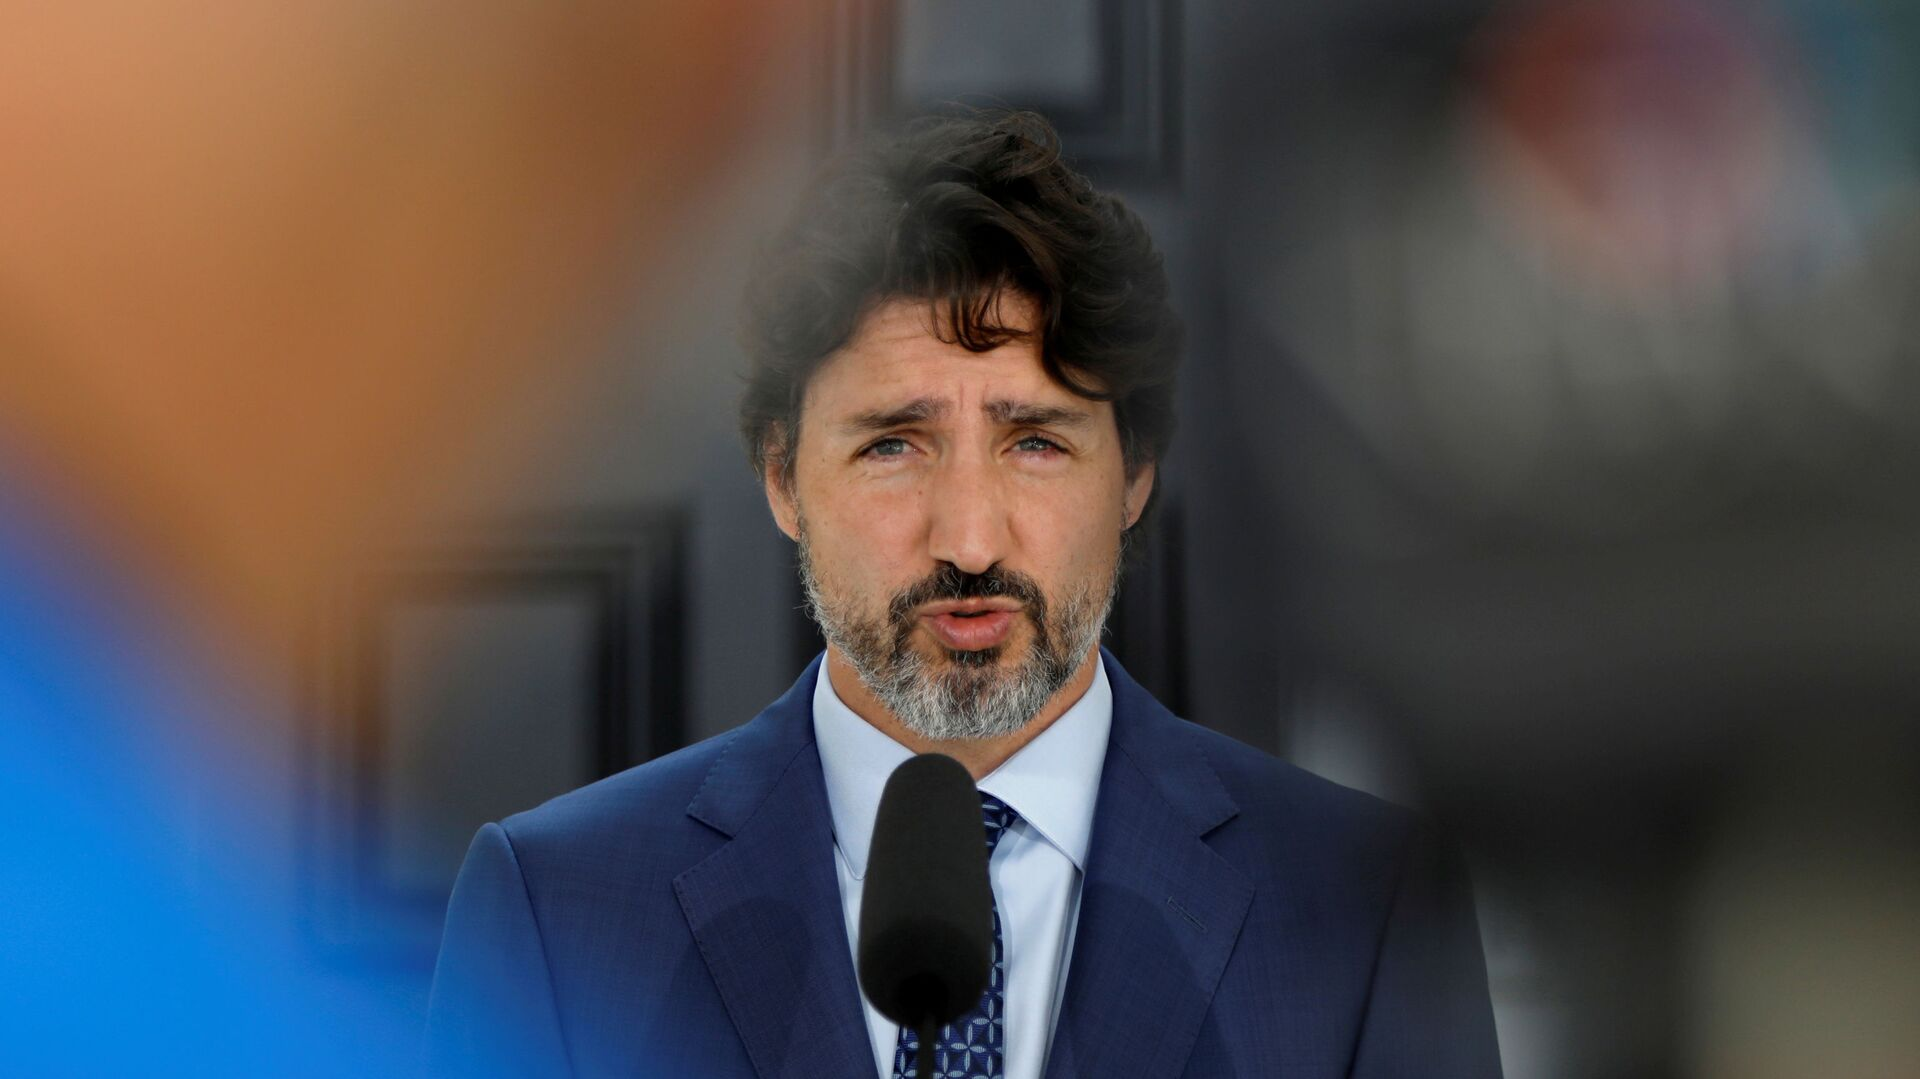 Justin Trudeau, primer ministro de Canadá  - Sputnik Mundo, 1920, 03.03.2021